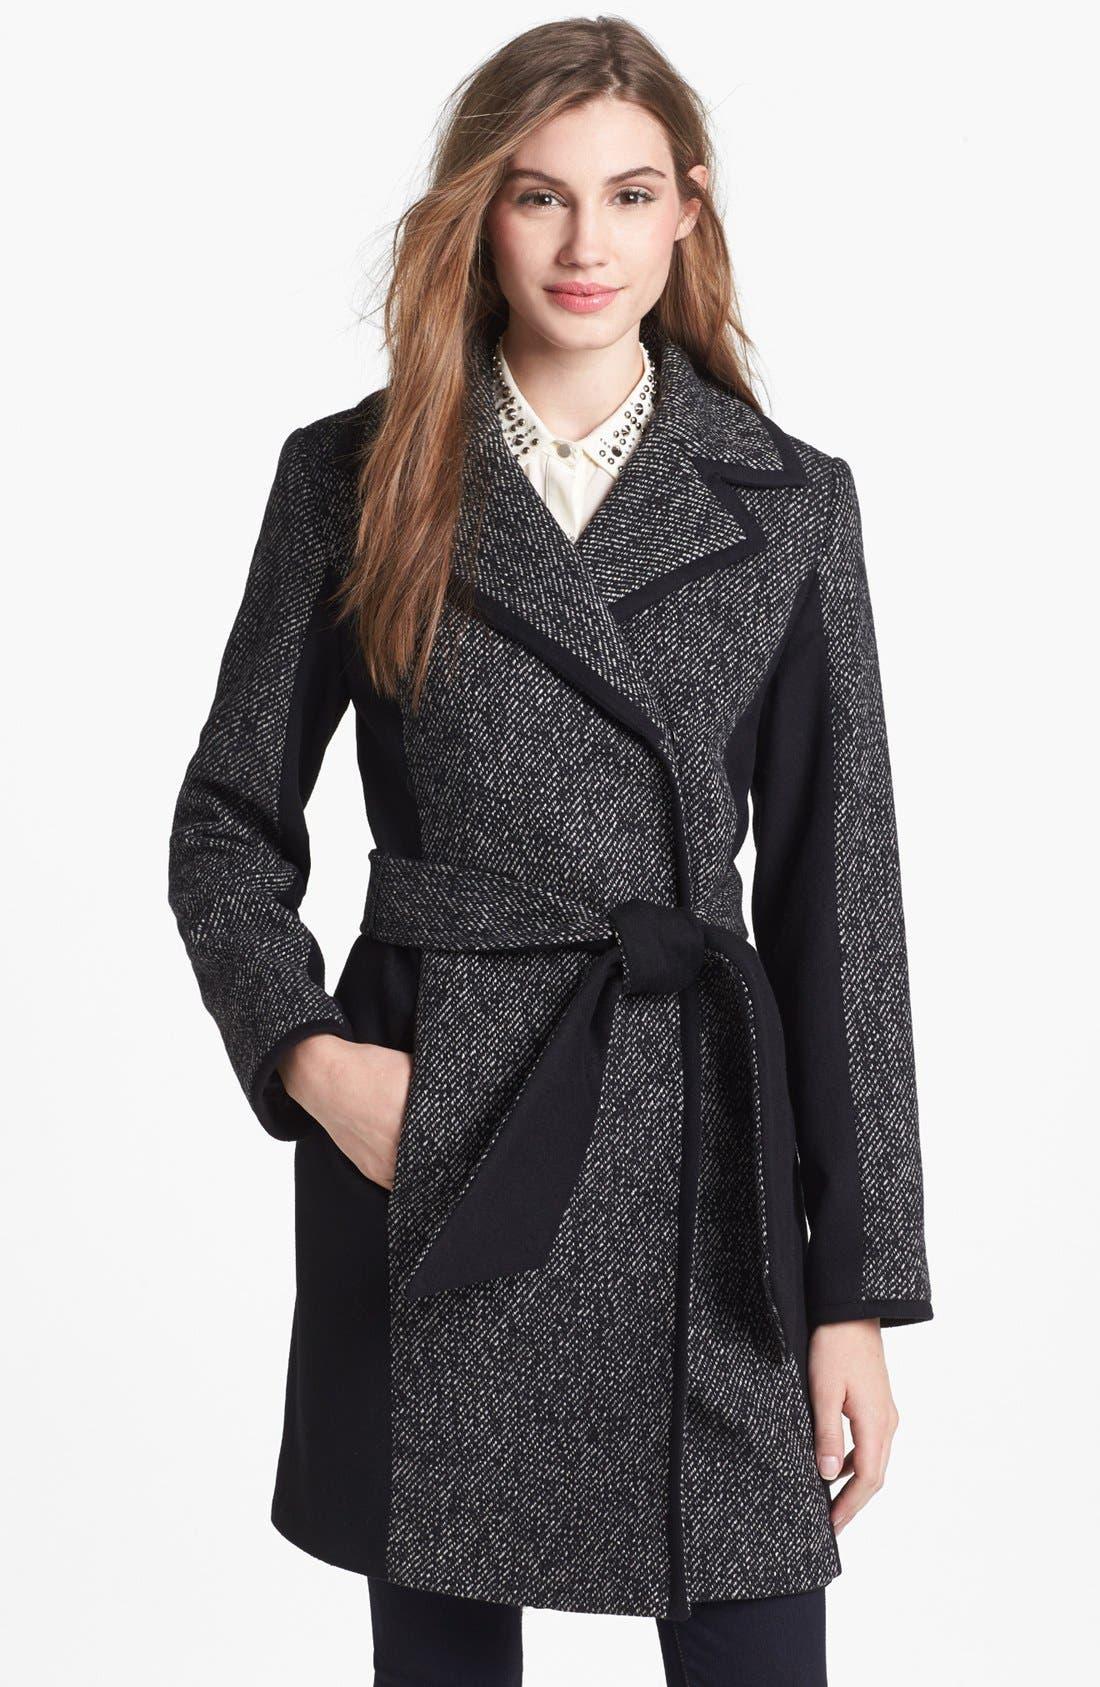 Main Image - Kristen Blake Belted Colorblocked Tweed Coat (Petite)